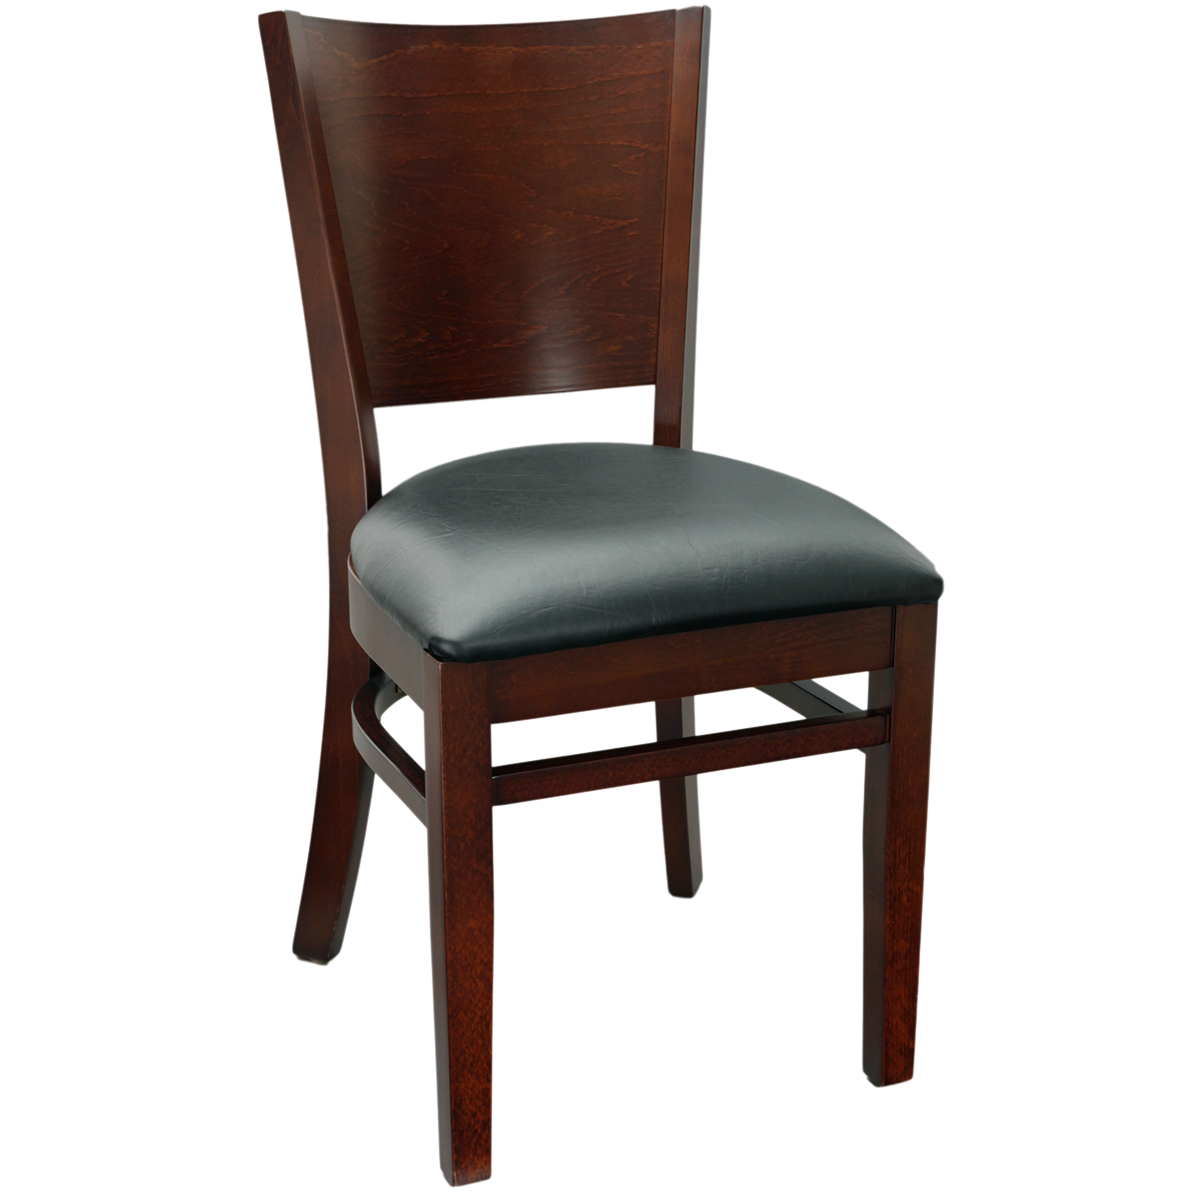 Wood Flared Back Chair